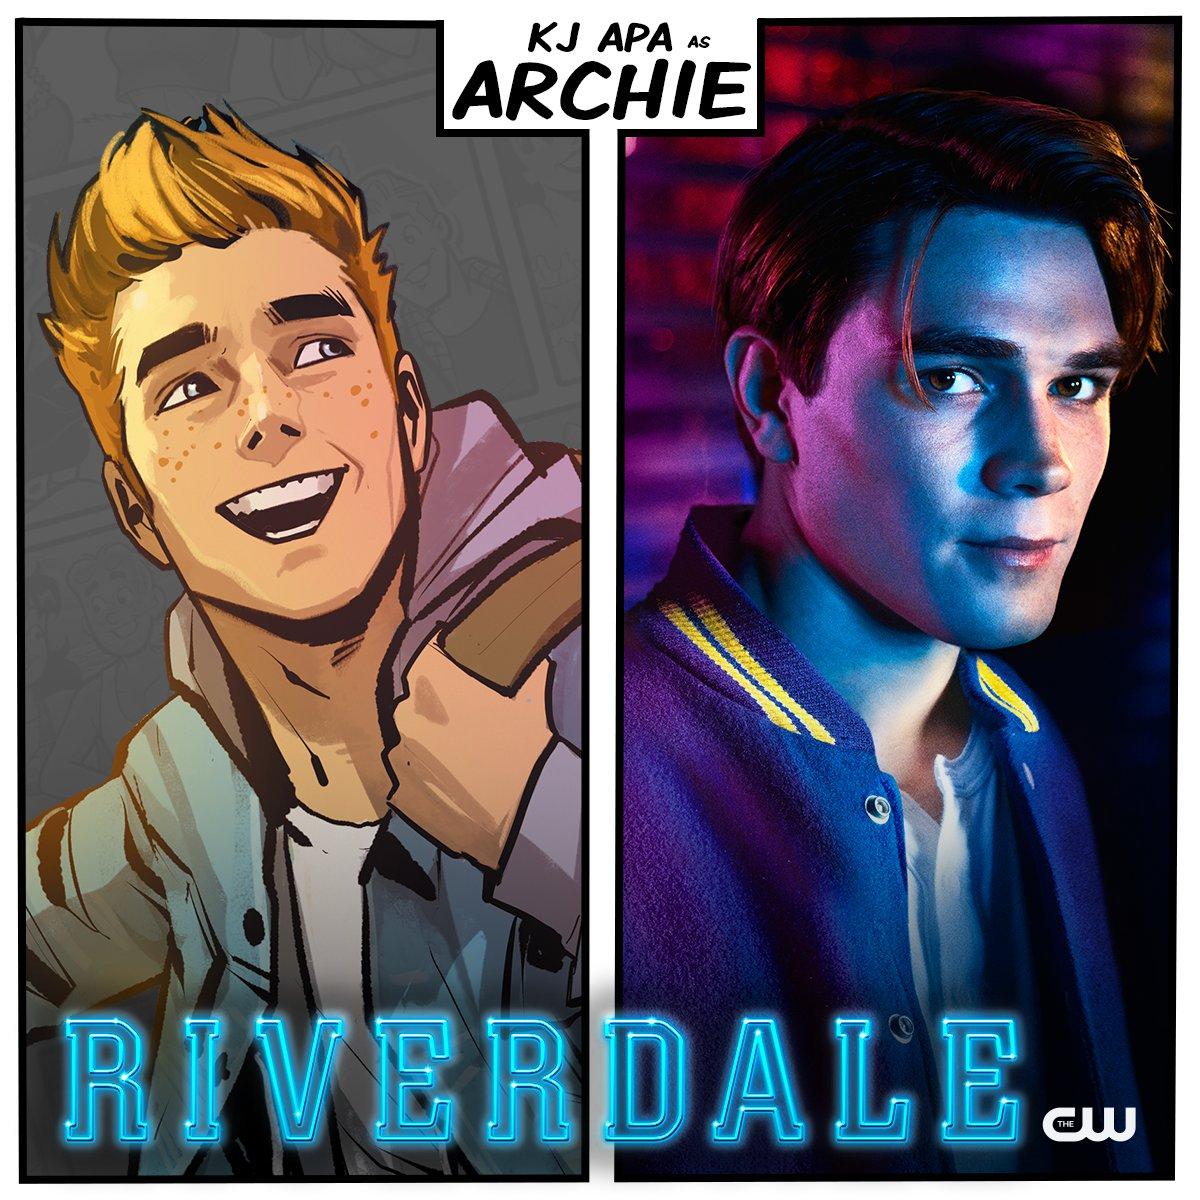 Riverdale on Twitter: